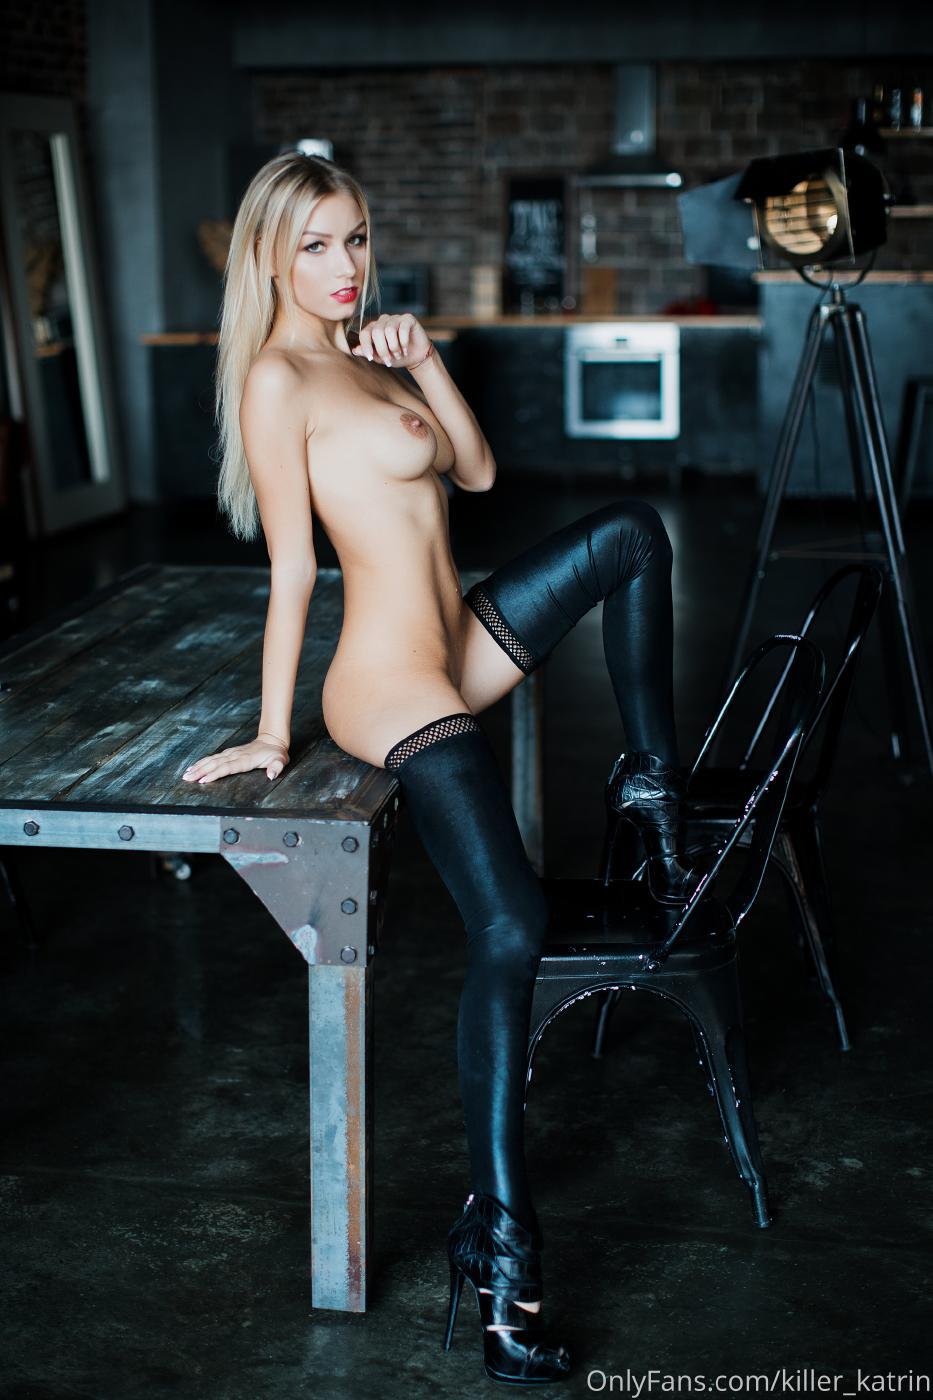 Killer Katrin Topless Bar Strip Onlyfans Set Leaked Bqbvzc